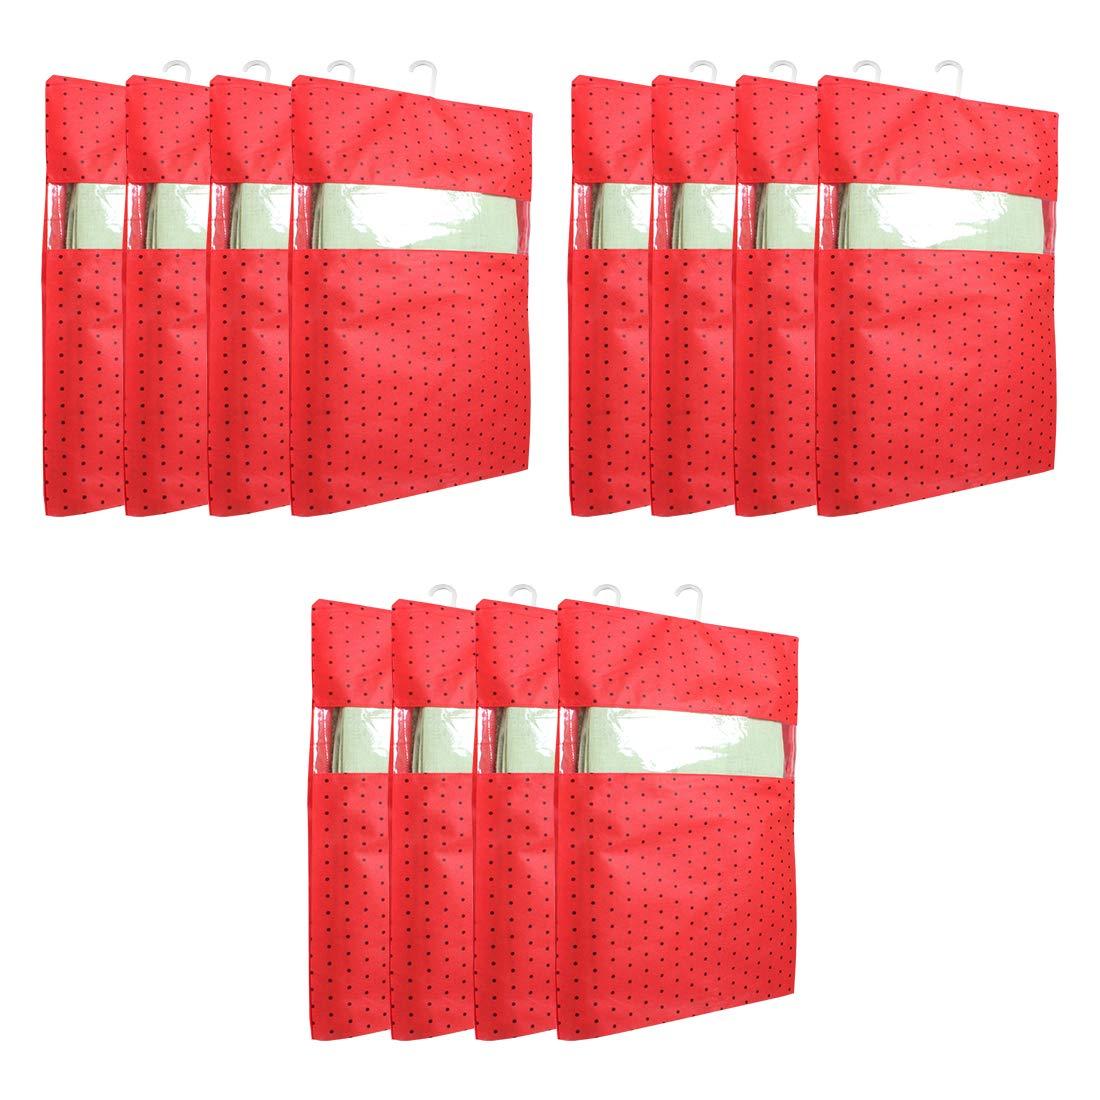 PrettyKrafts dots Printed Hanging Saree Cover Wardrobe Organiser (Set of 12 pcs) - Red (B081W5GM3L) Amazon Price History, Amazon Price Tracker